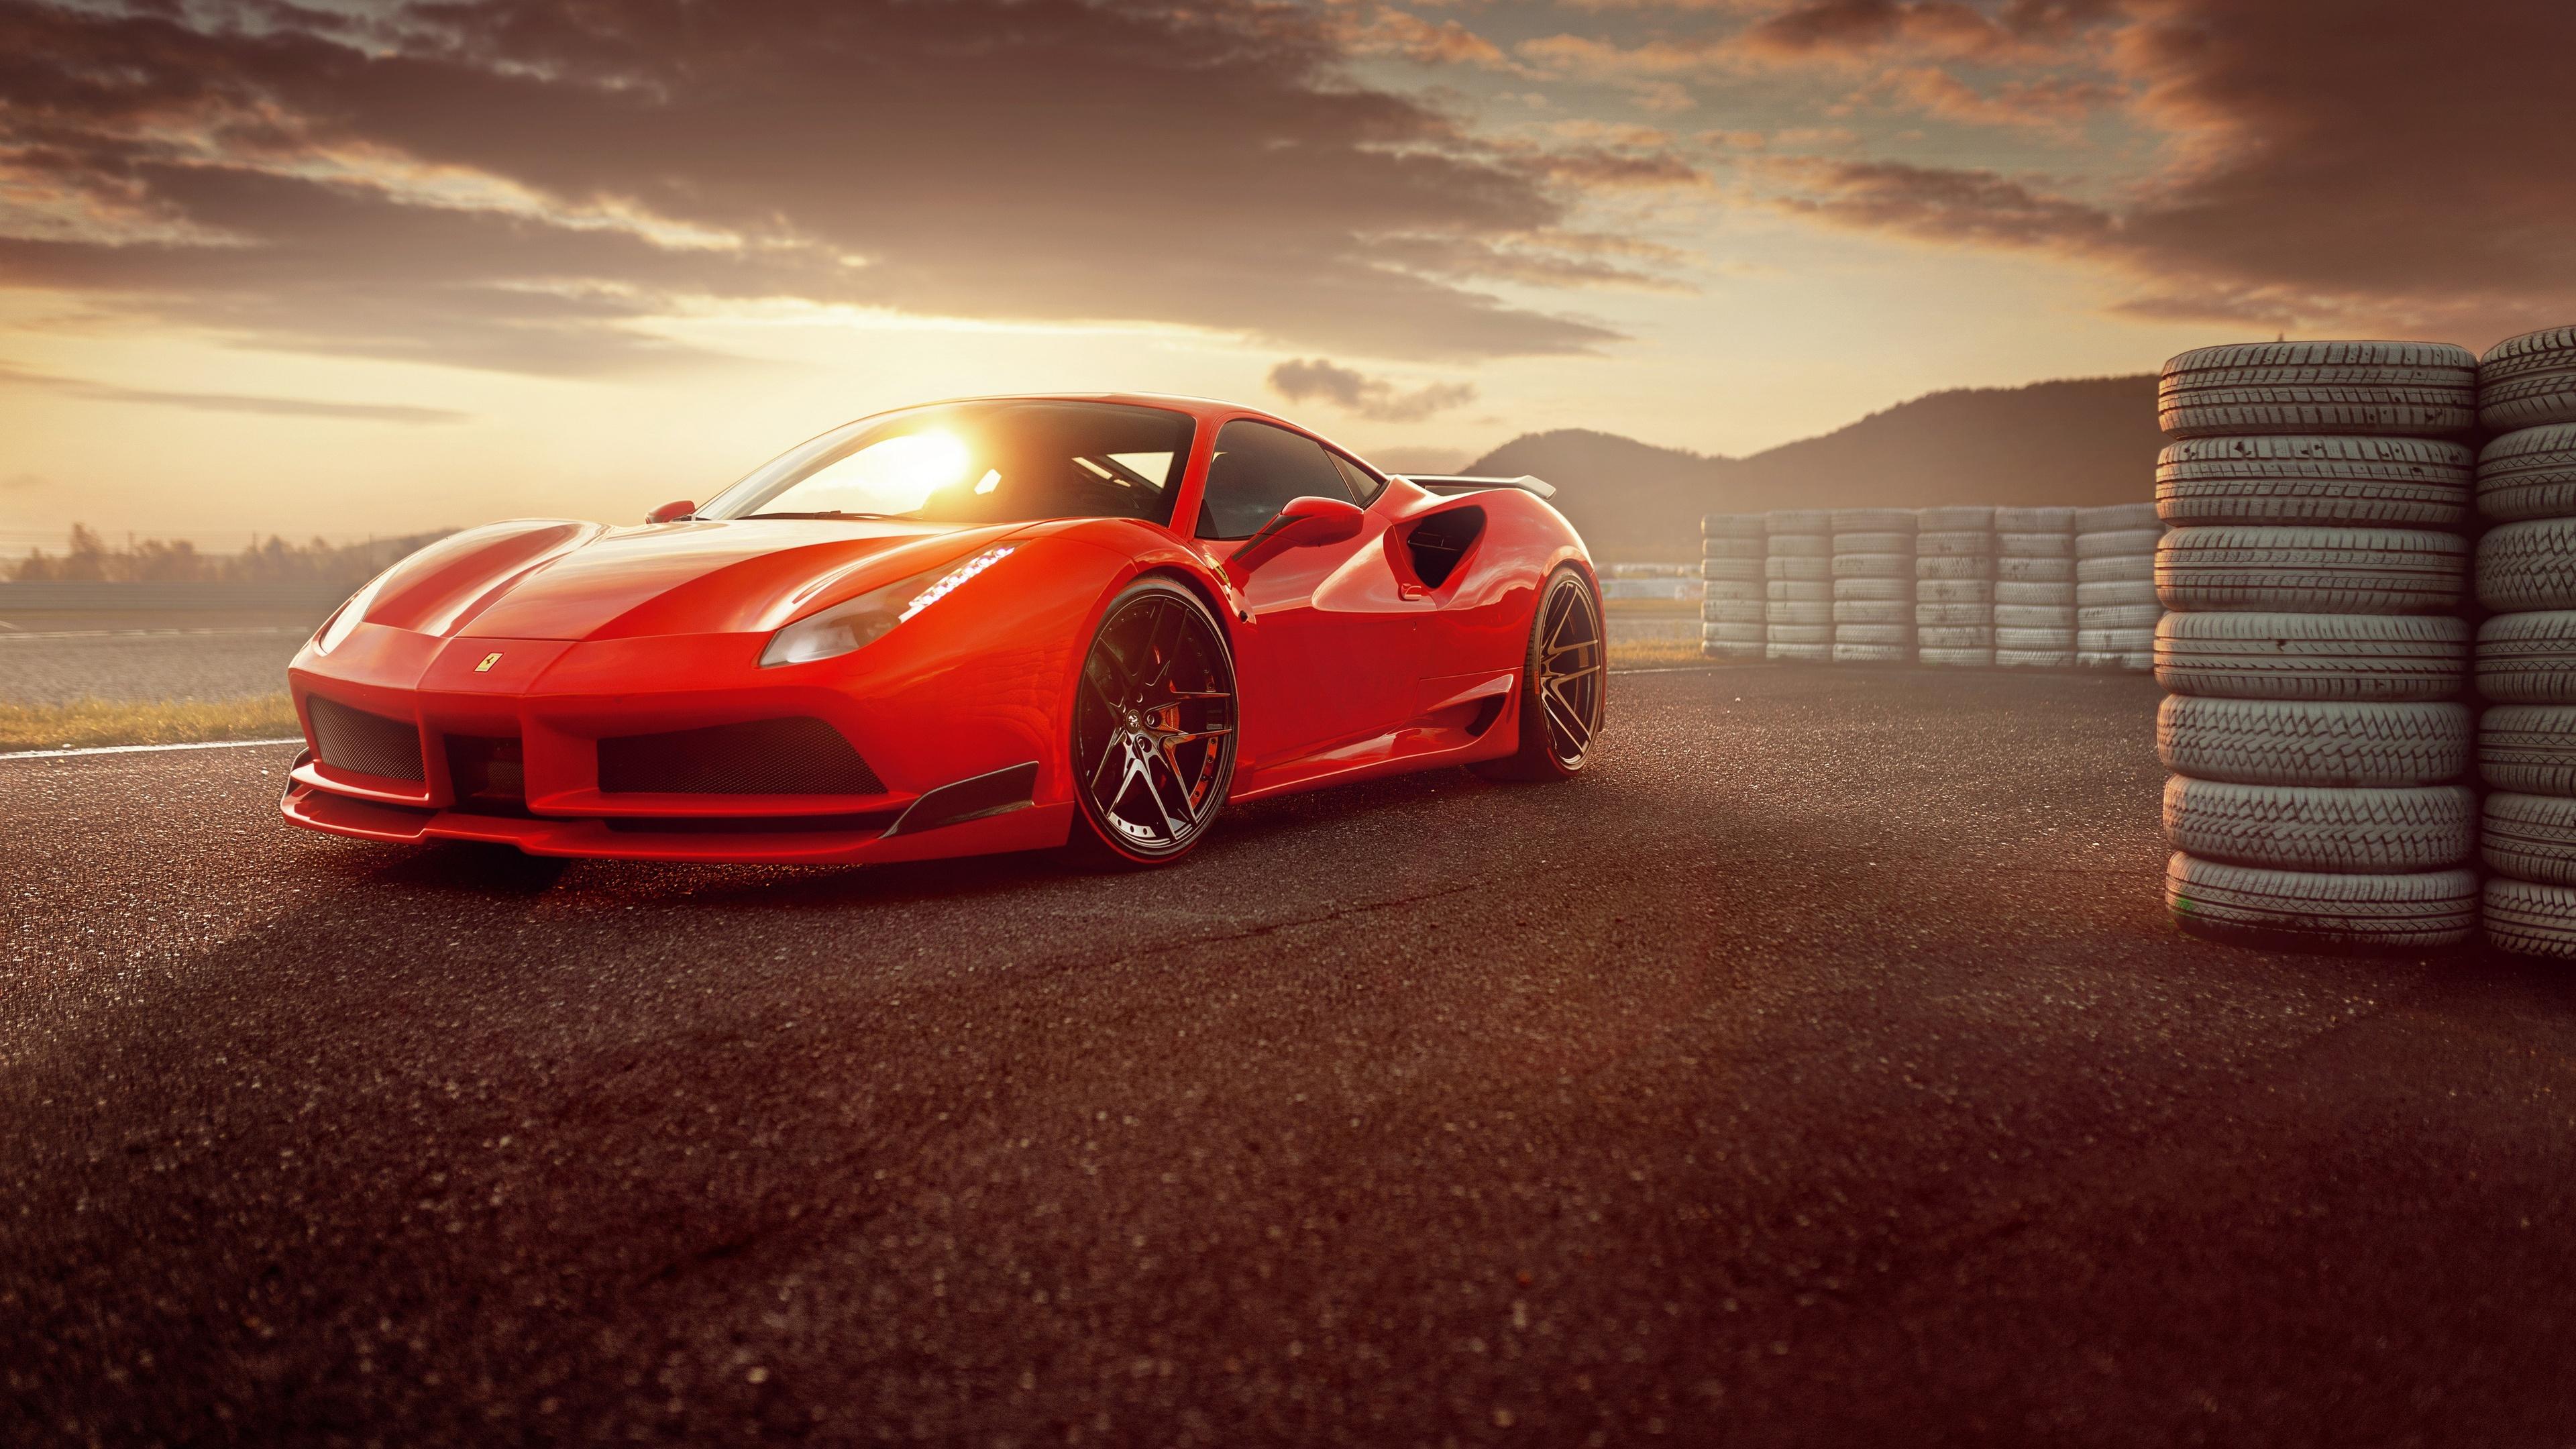 2017 ferrari 488 gtb 4k 1539105500 - 2017 Ferrari 488 Gtb 4k - hd-wallpapers, ferrari wallpapers, ferrari 488 wallpapers, 4k-wallpapers, 2017 cars wallpapers